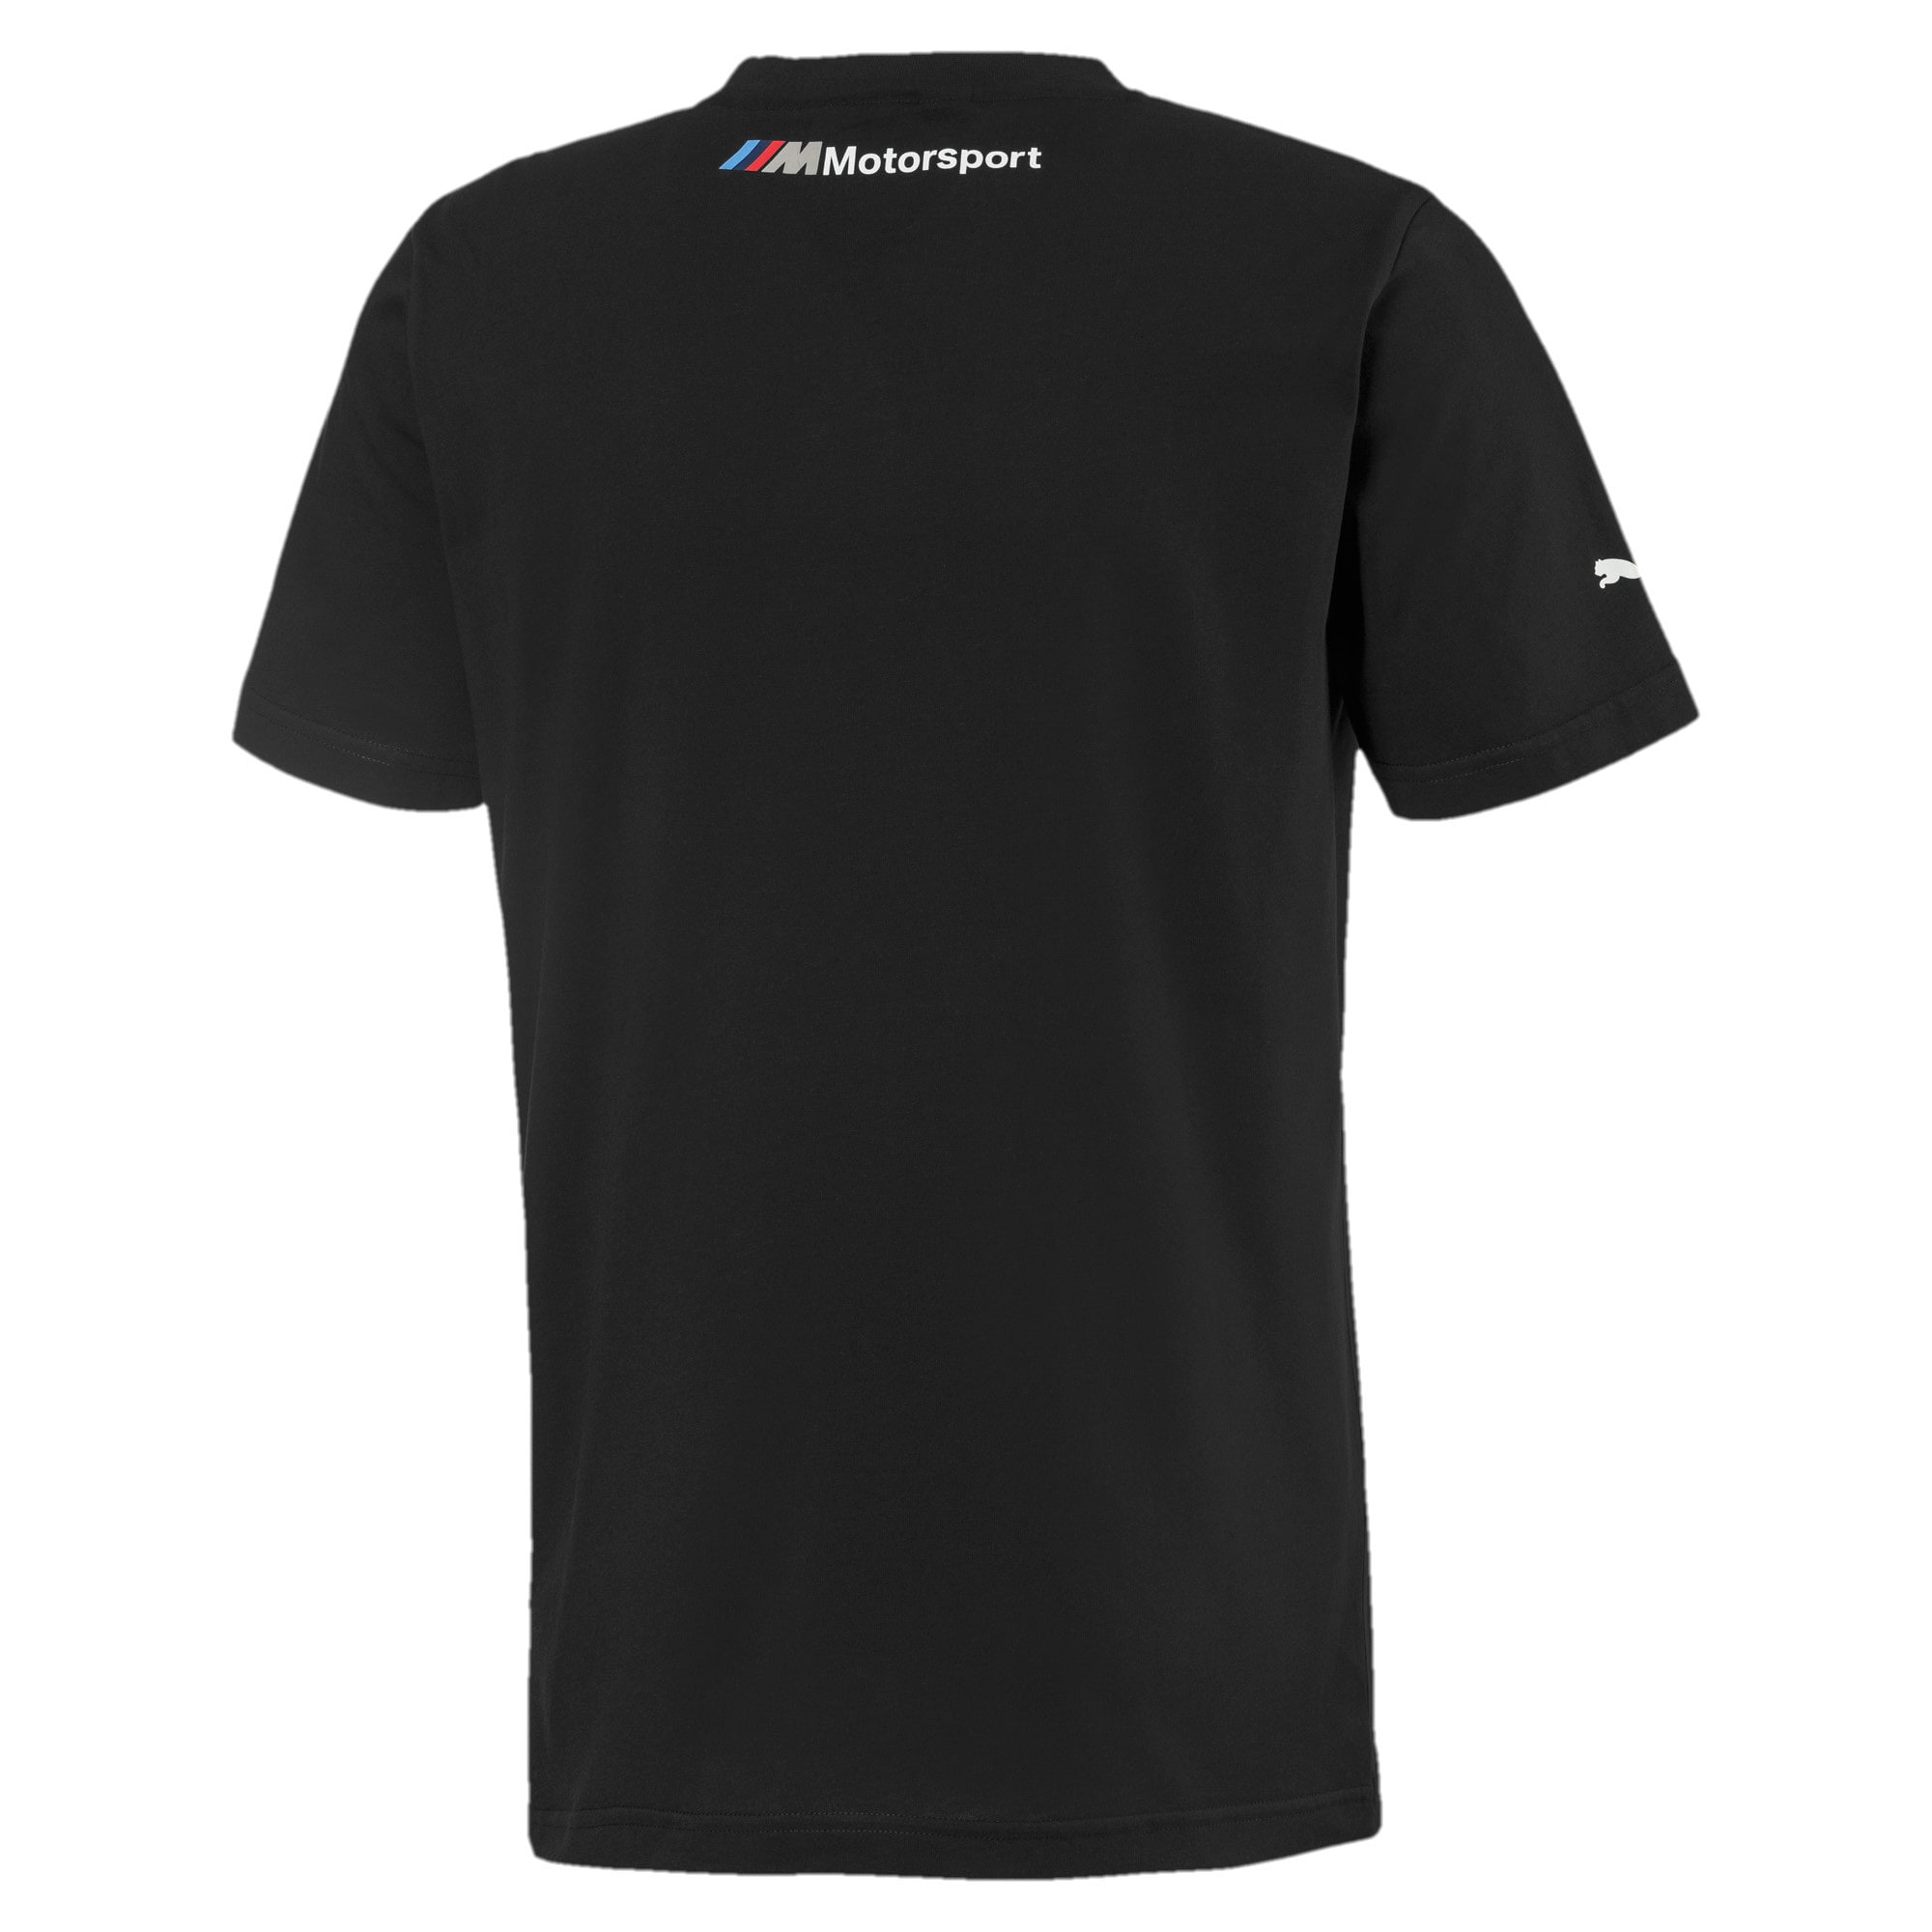 Thumbnail 5 van BMW M Motorsports logo-T-shirt voor mannen, Puma Black, medium